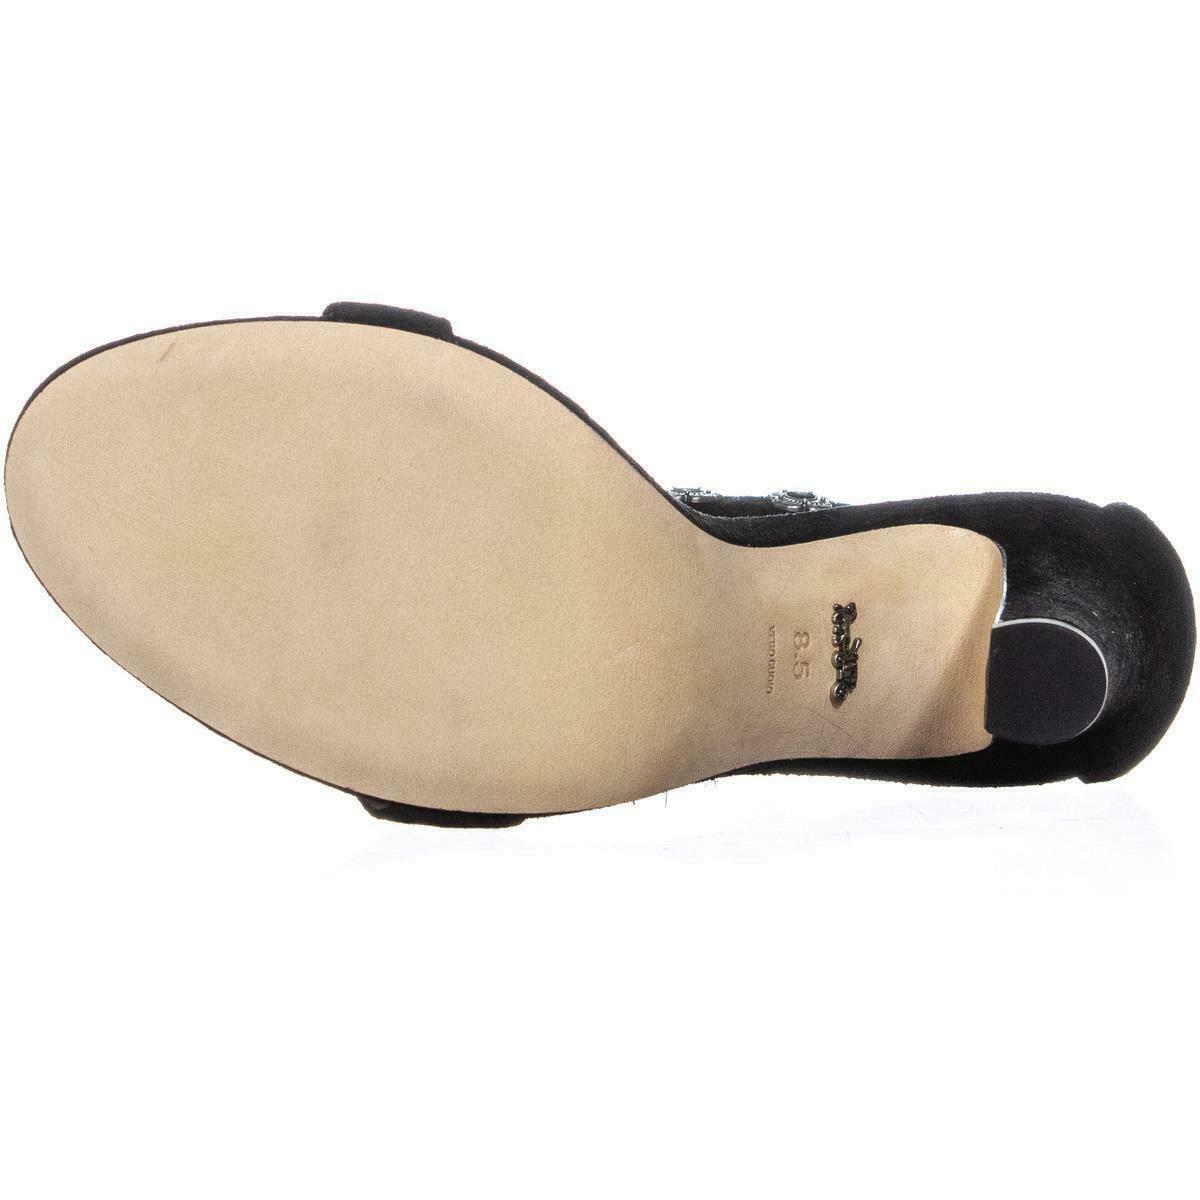 Coach Elizabeth102 Ankle Strap Sandals, Black image 6